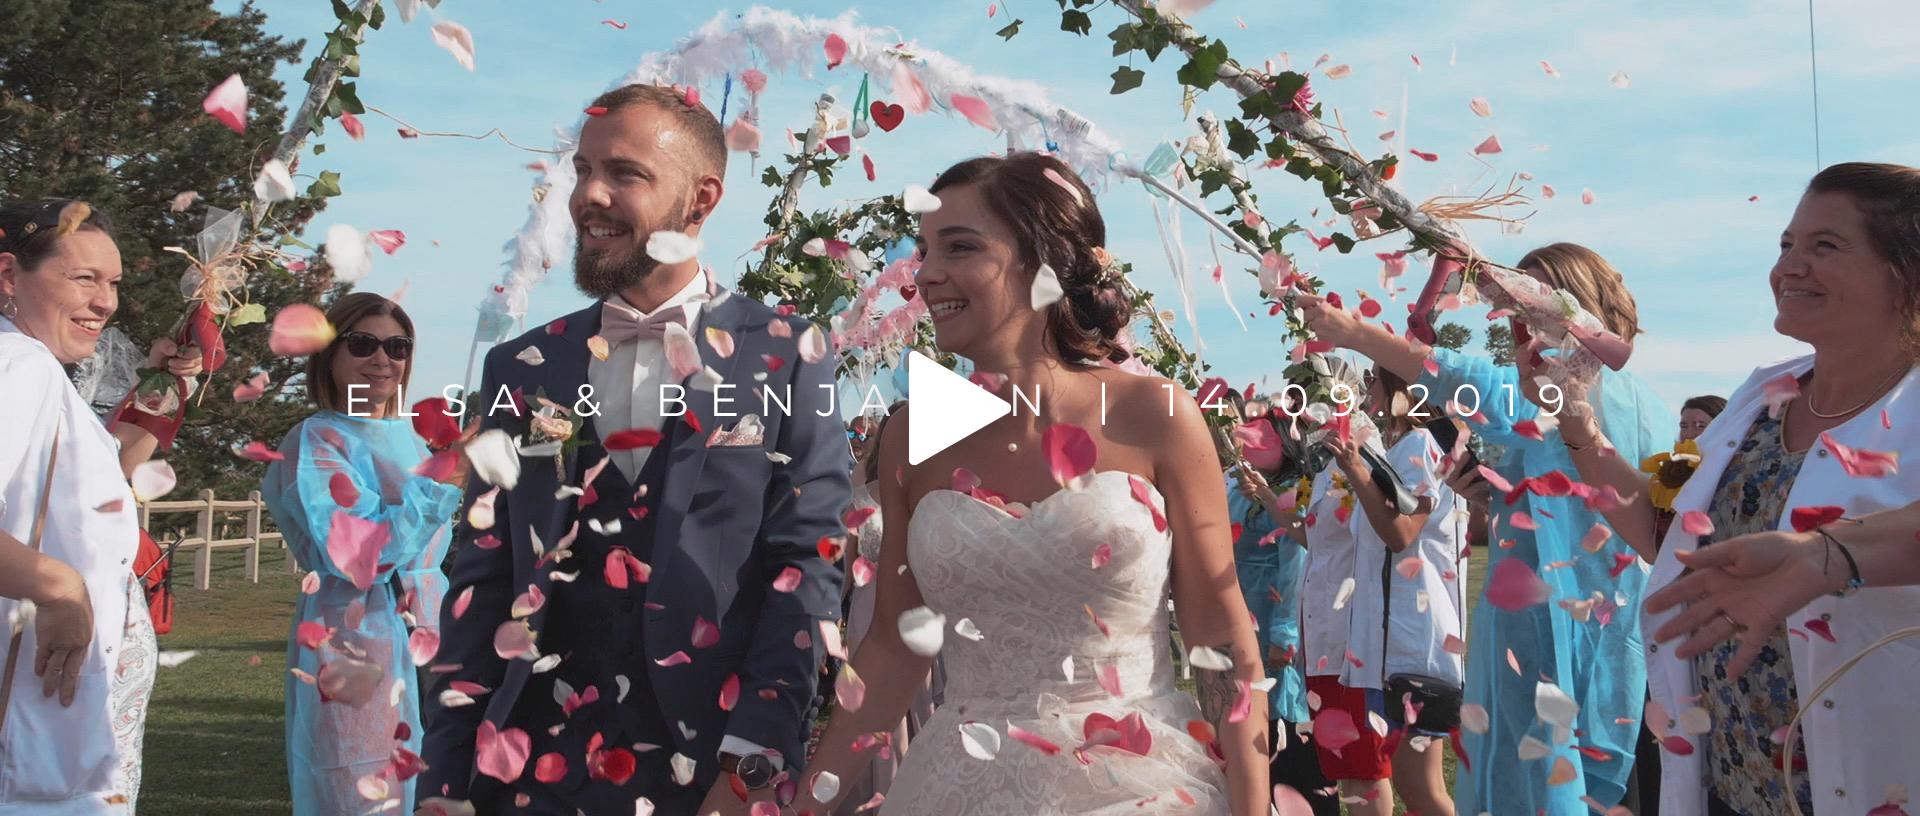 Mariage Elsa & Benjamin | Ferme Weyerbach à Dietwiller